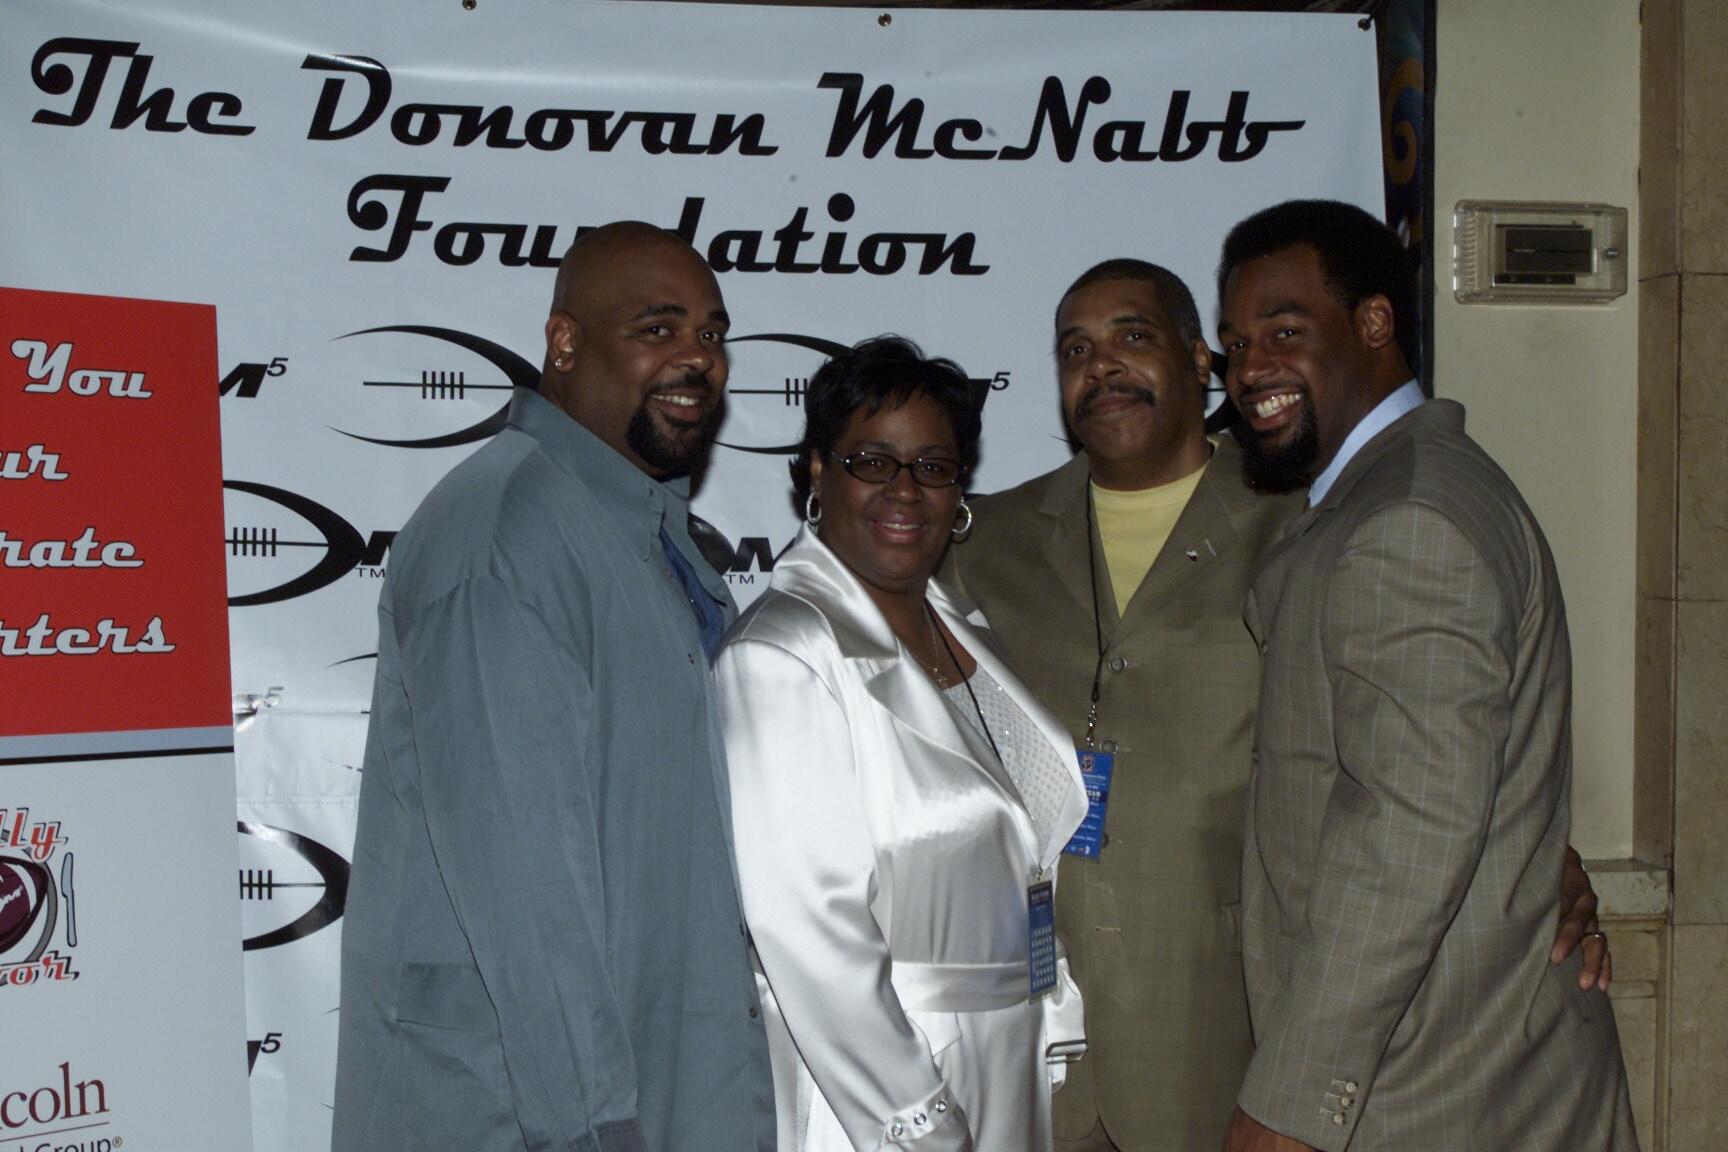 Leading Nfl Quarterback Donovan Mcnabb Partners With Novartis